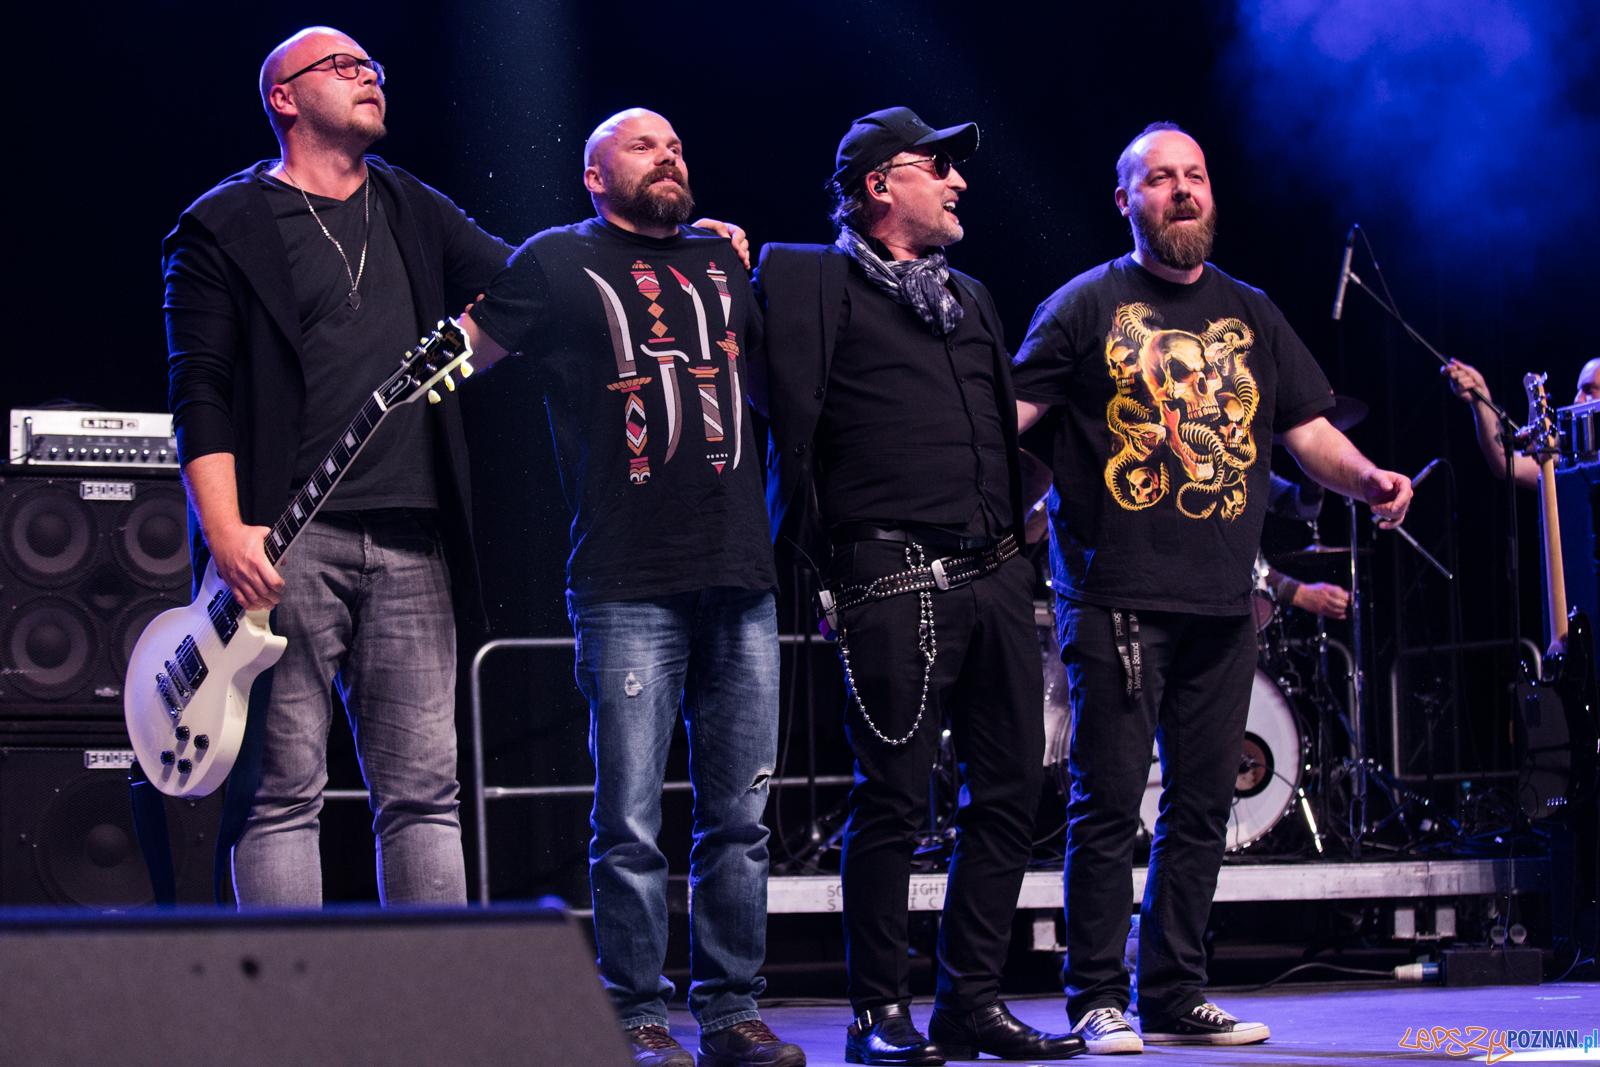 Lalamido - rock festiwal (24.10.2017) hala Arena  Foto: © lepszyPOZNAN.pl / Karolina Kiraga